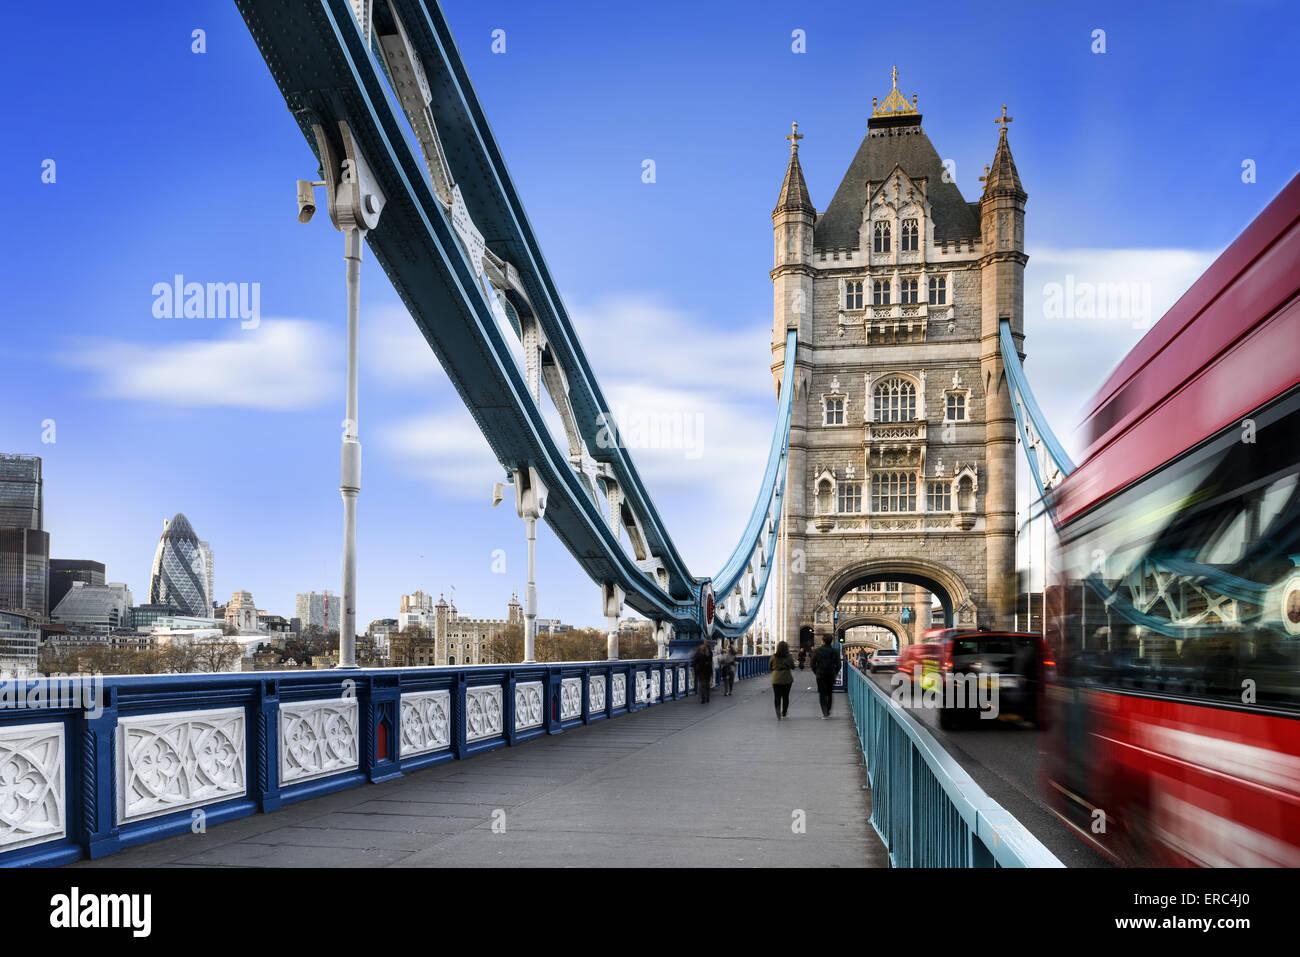 Célèbre Tower Bridge avec trafic jame, Londres, Angleterre Photo Stock